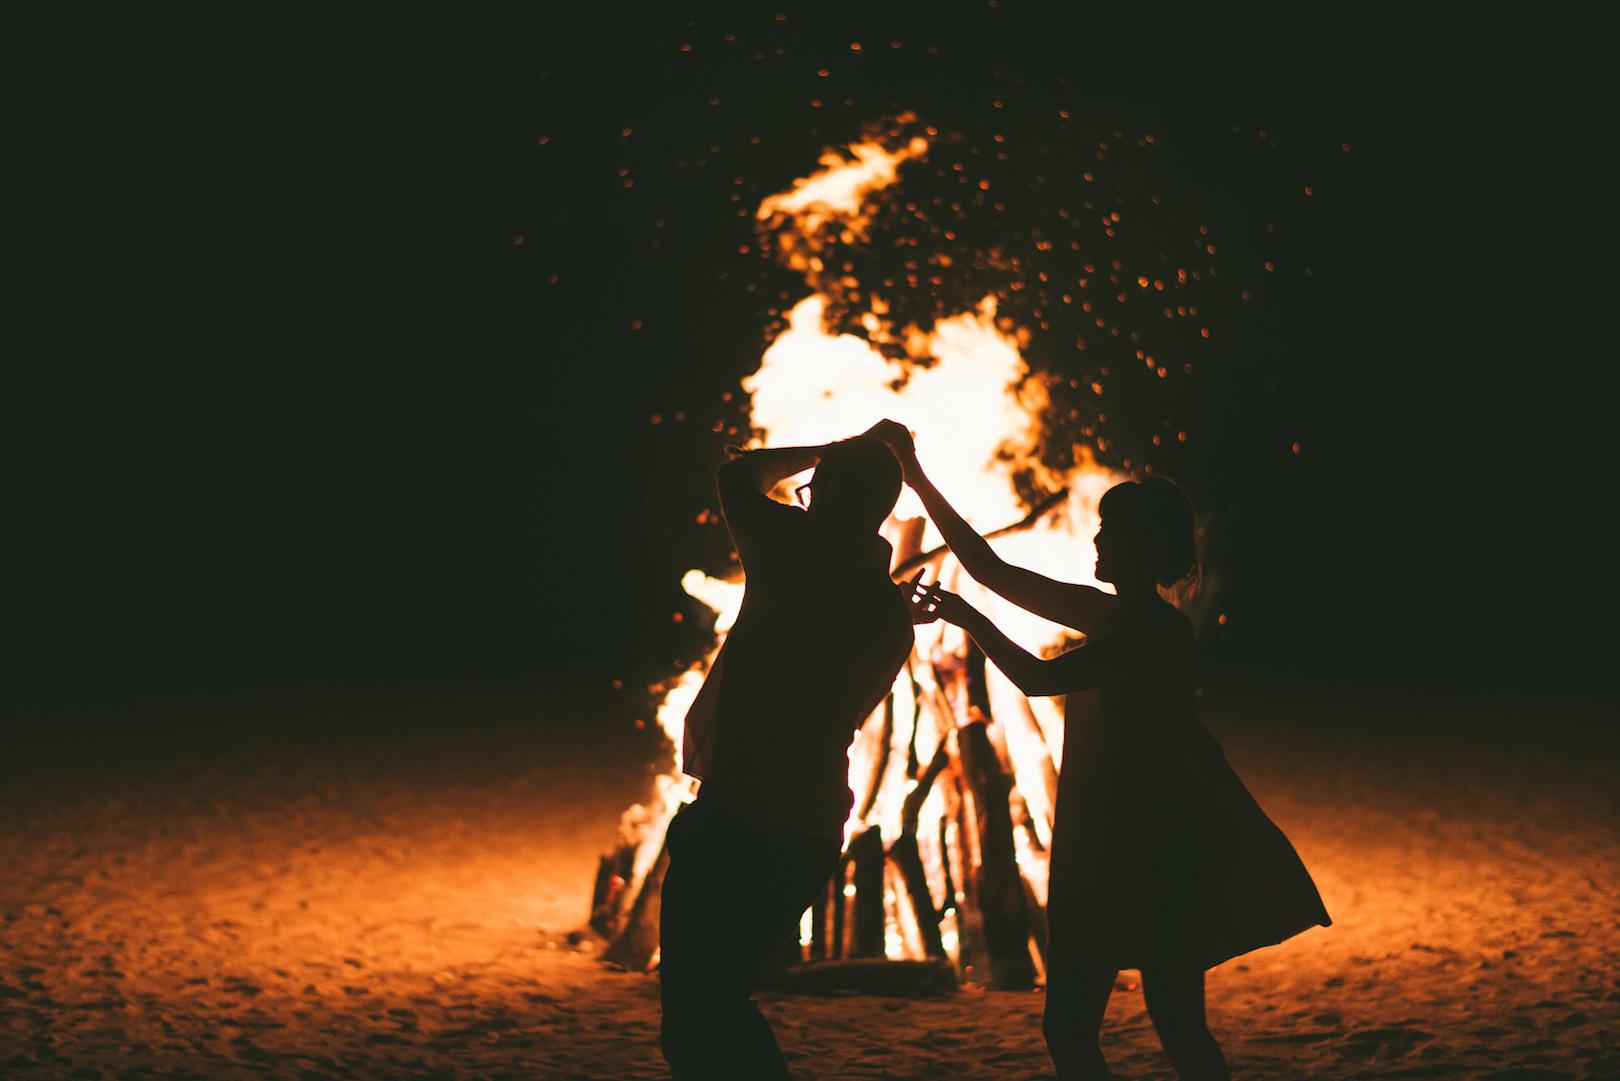 Nathan & Felicia - Wedding Day - © Dallas Kolotylo Photography - 800